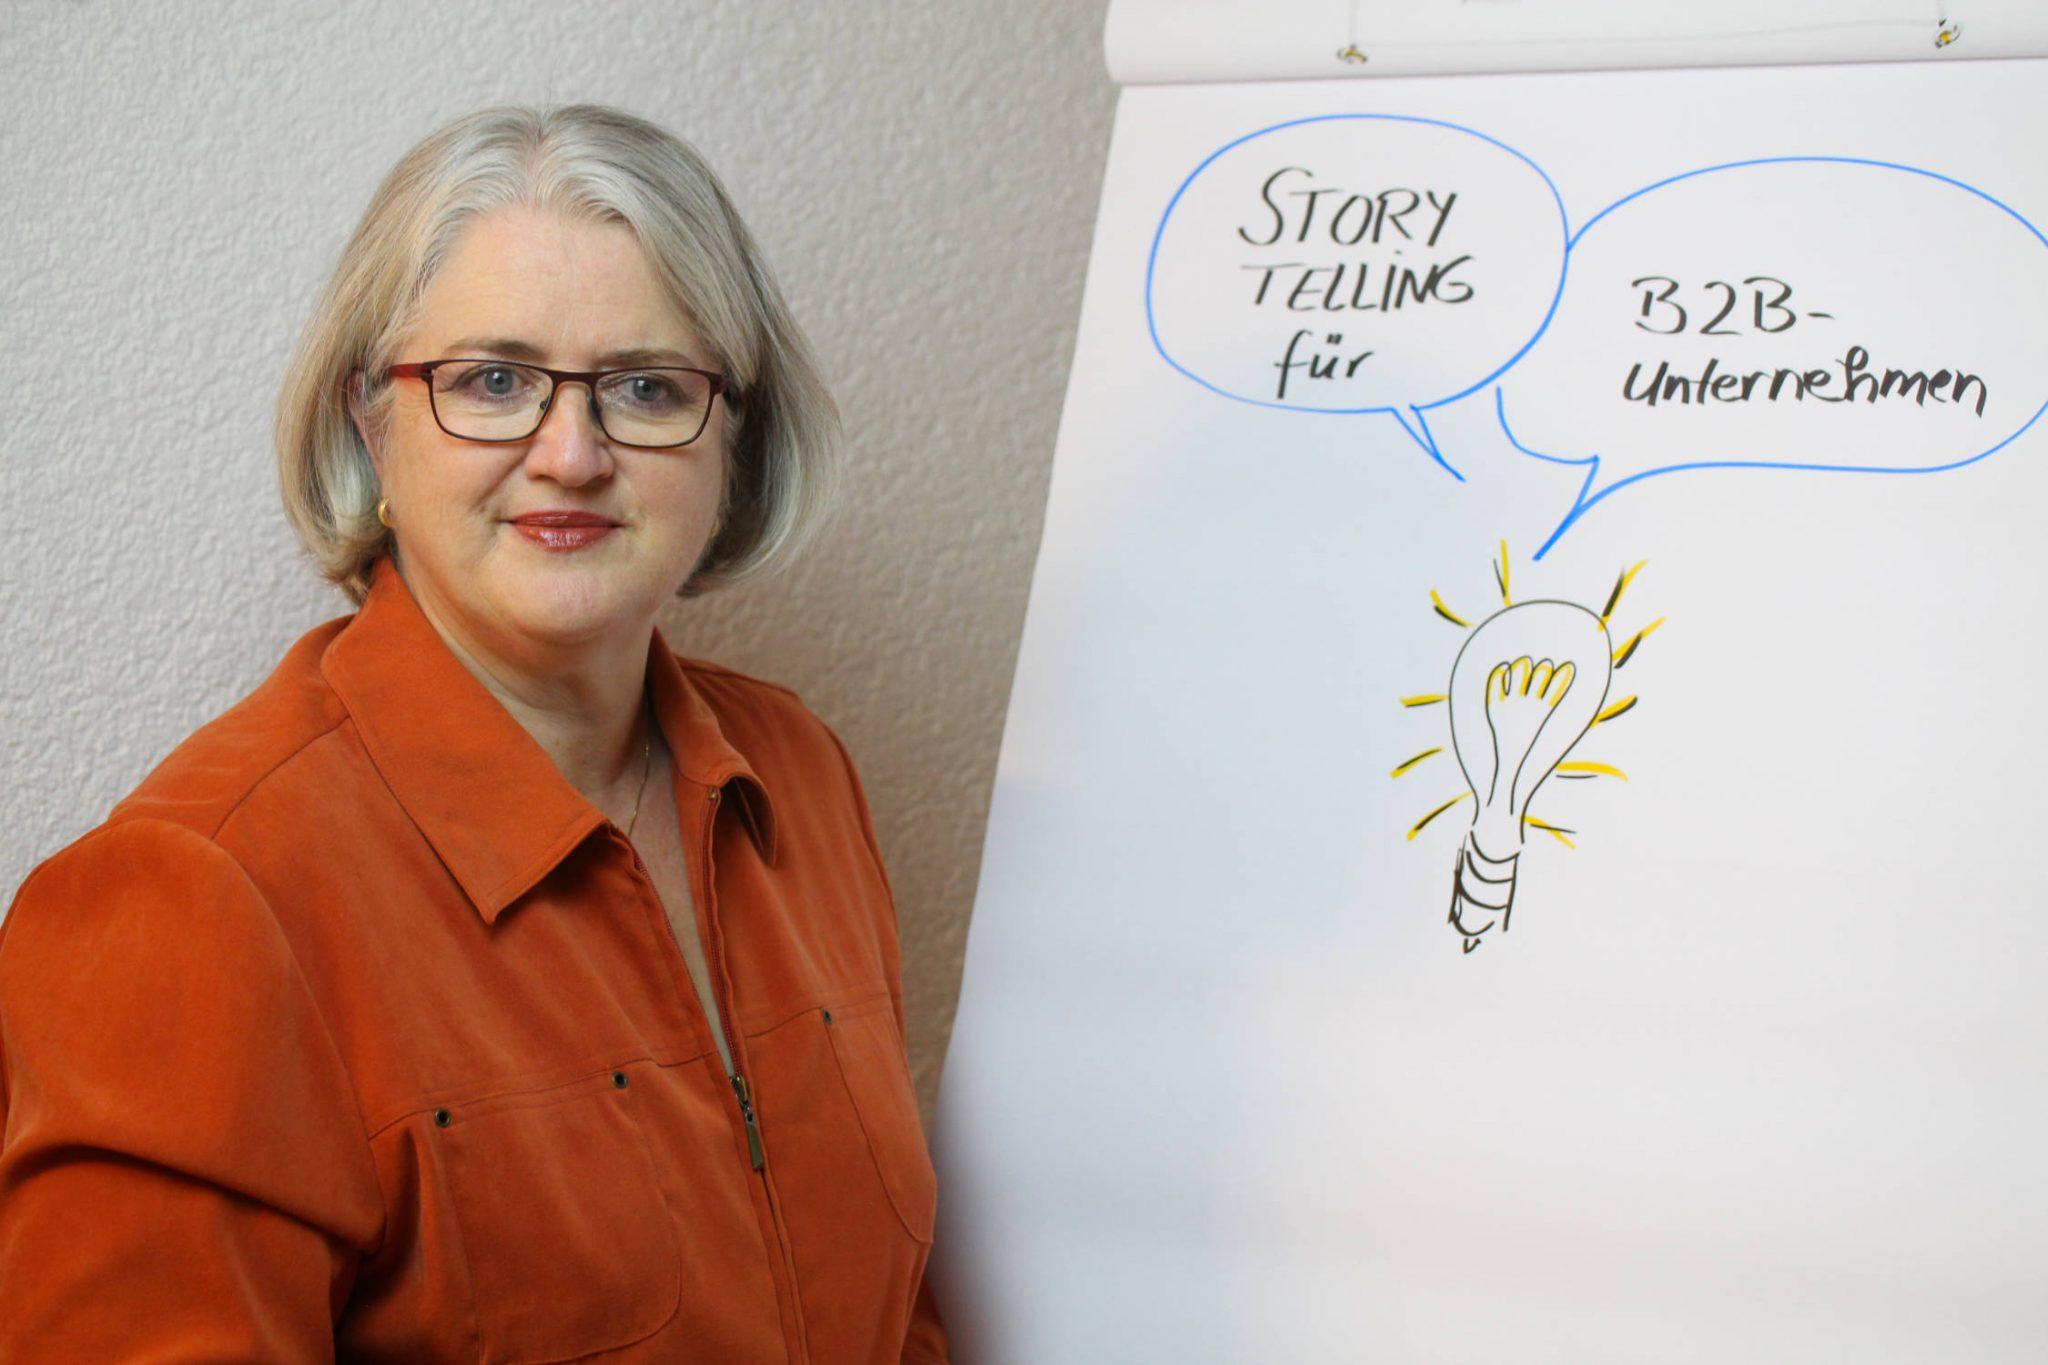 Foto: Manuela Seubert am Flipchart; Storytelling für B2B-Unternehmen